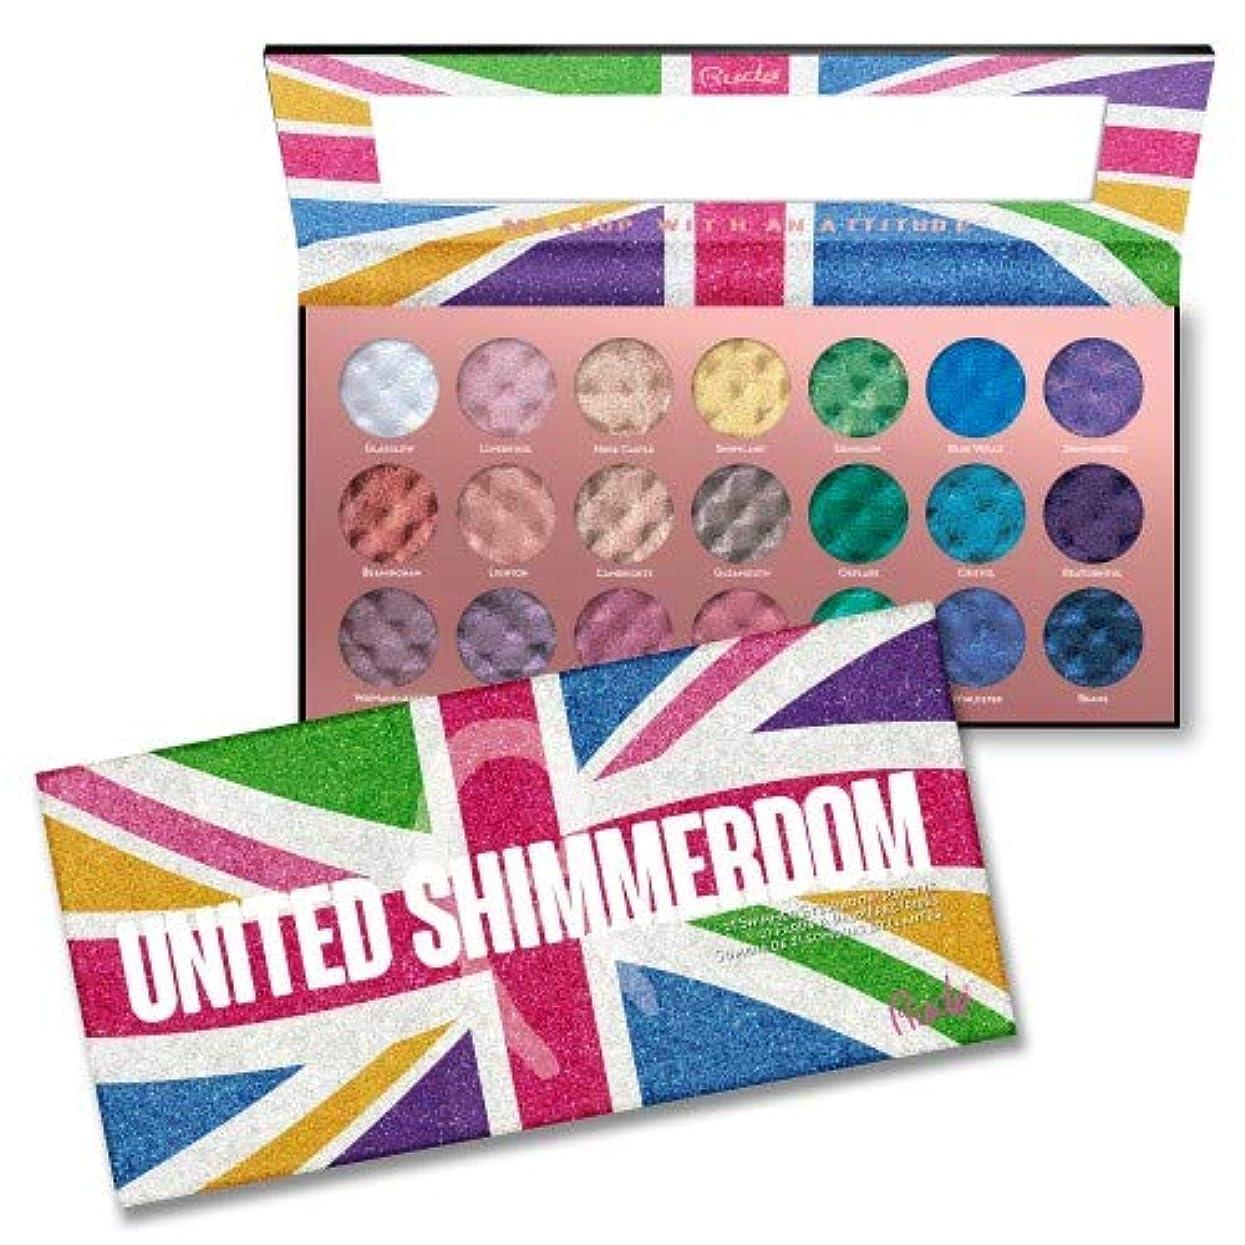 RUDE United Shimmerdom - 21 Shimmer Eyeshadow Palette (並行輸入品)